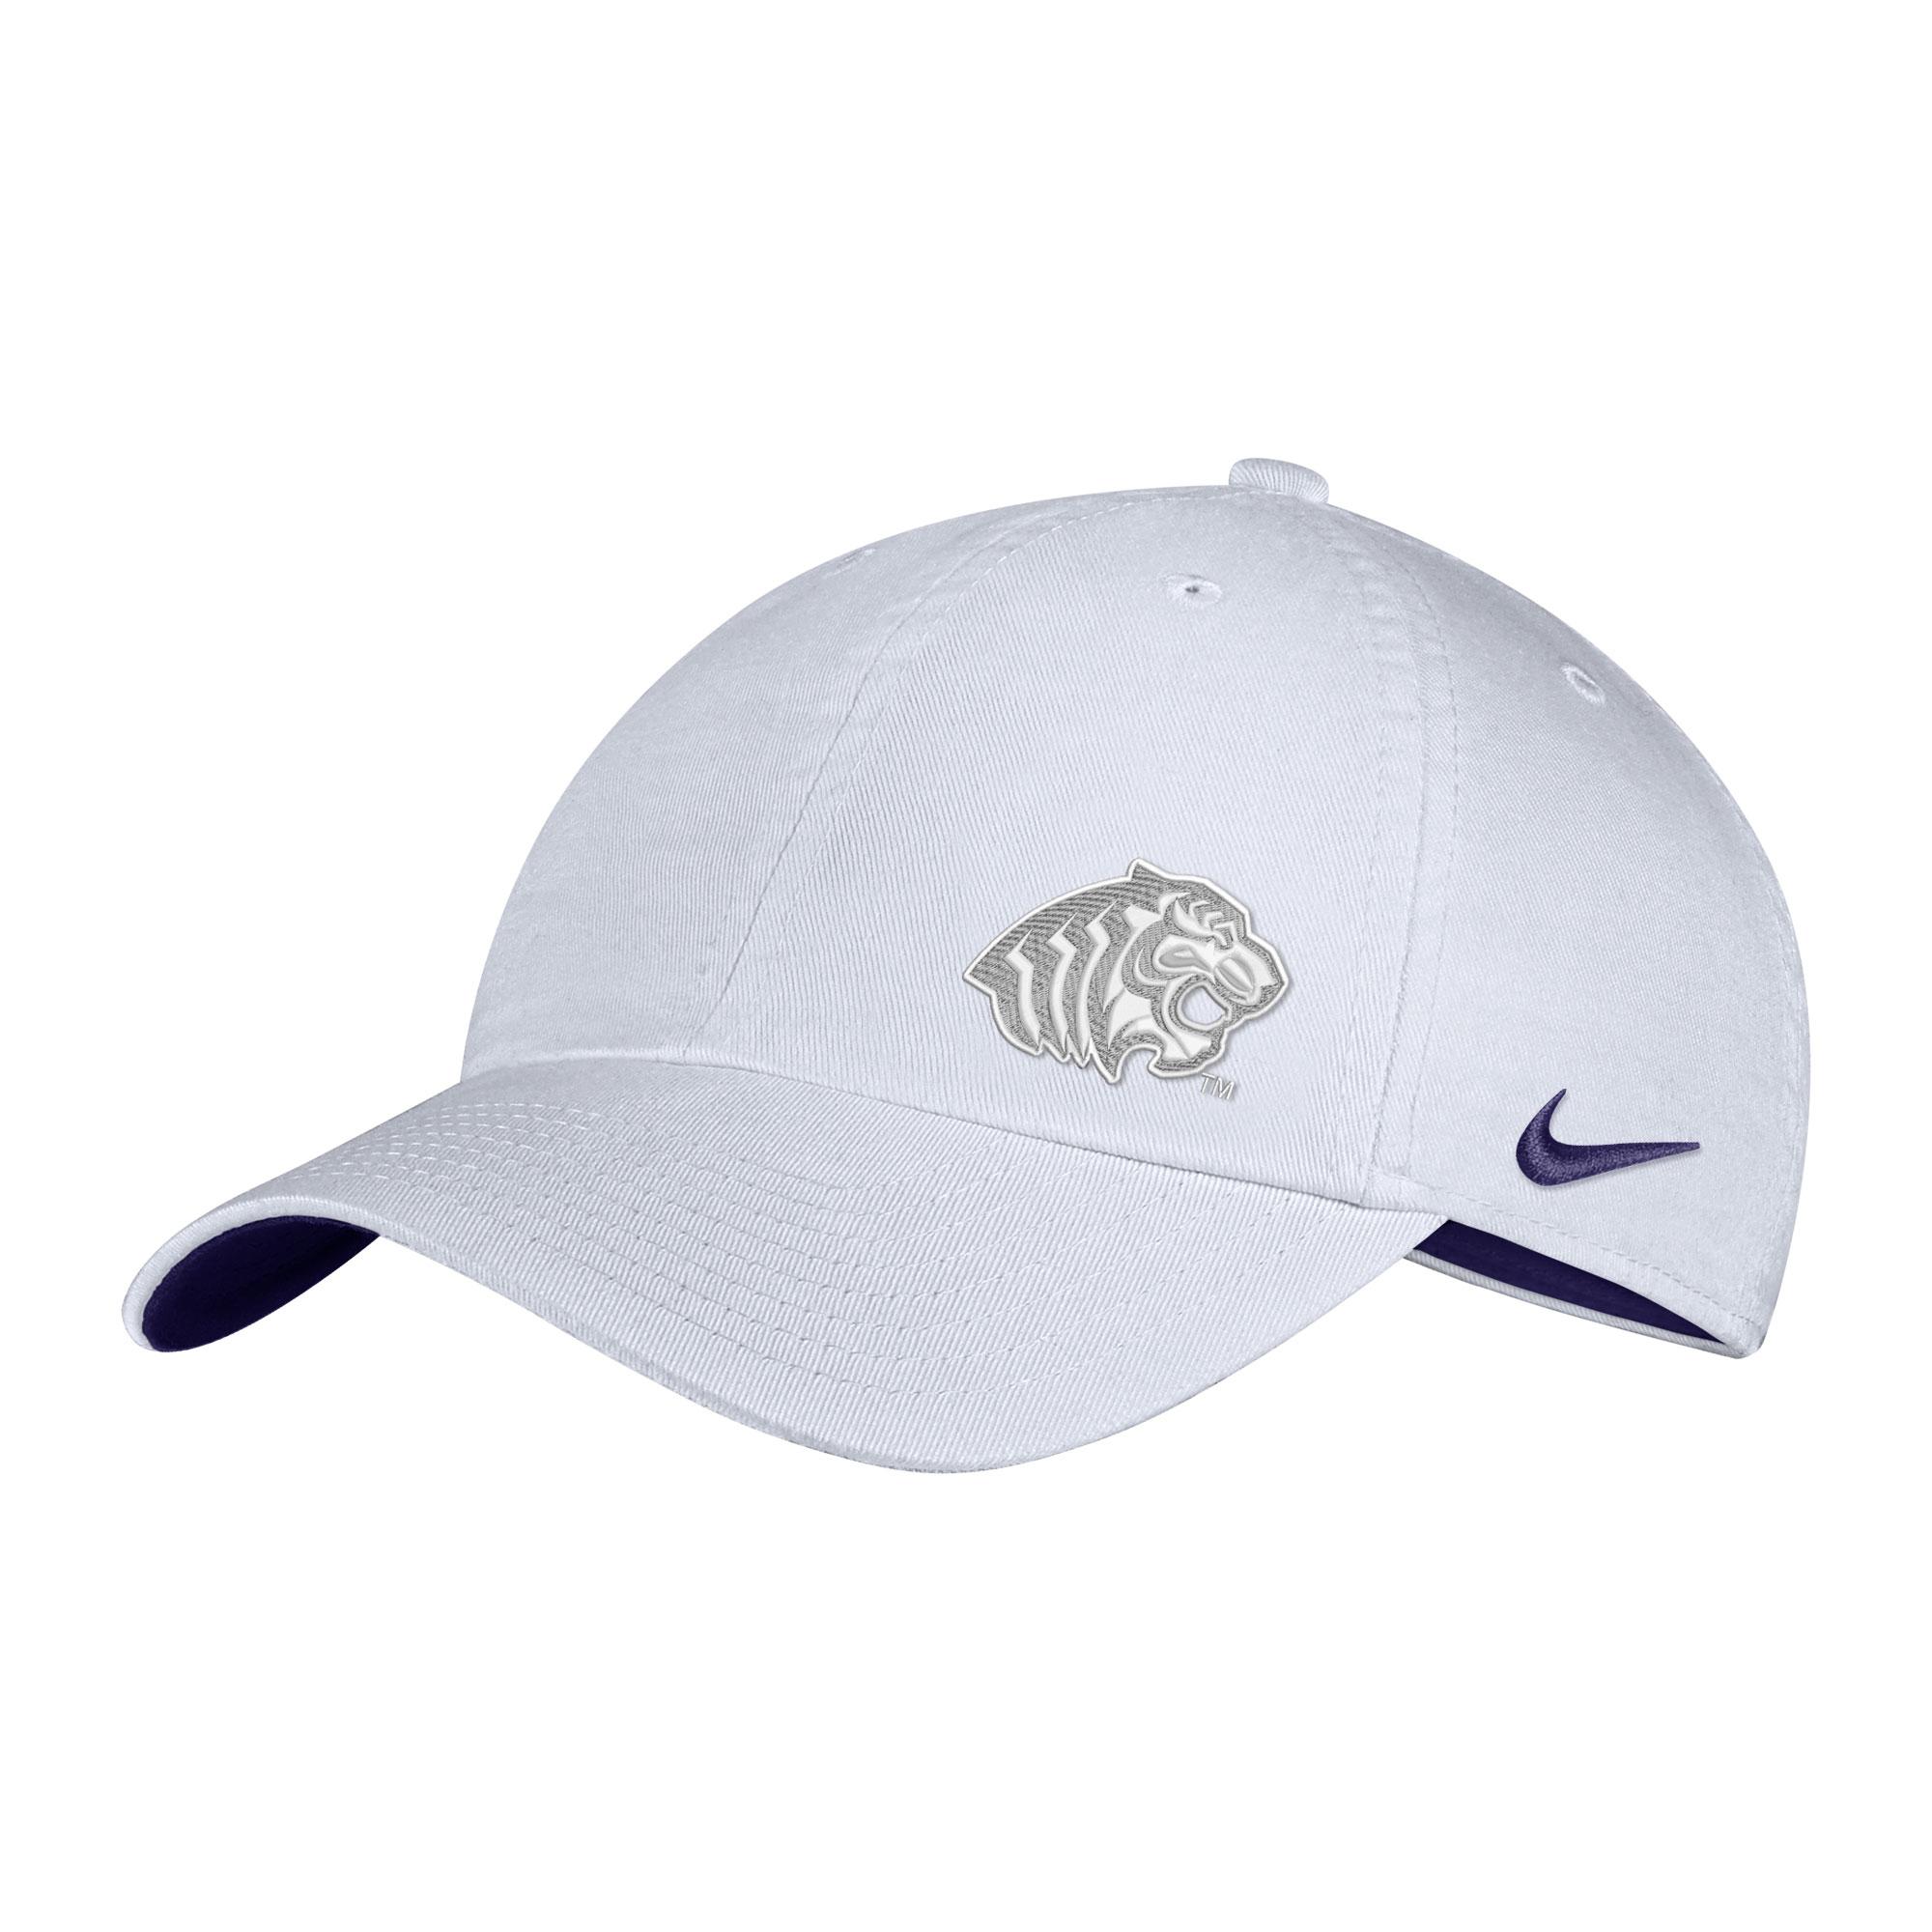 image of: WOMEN'S NIKE CAP